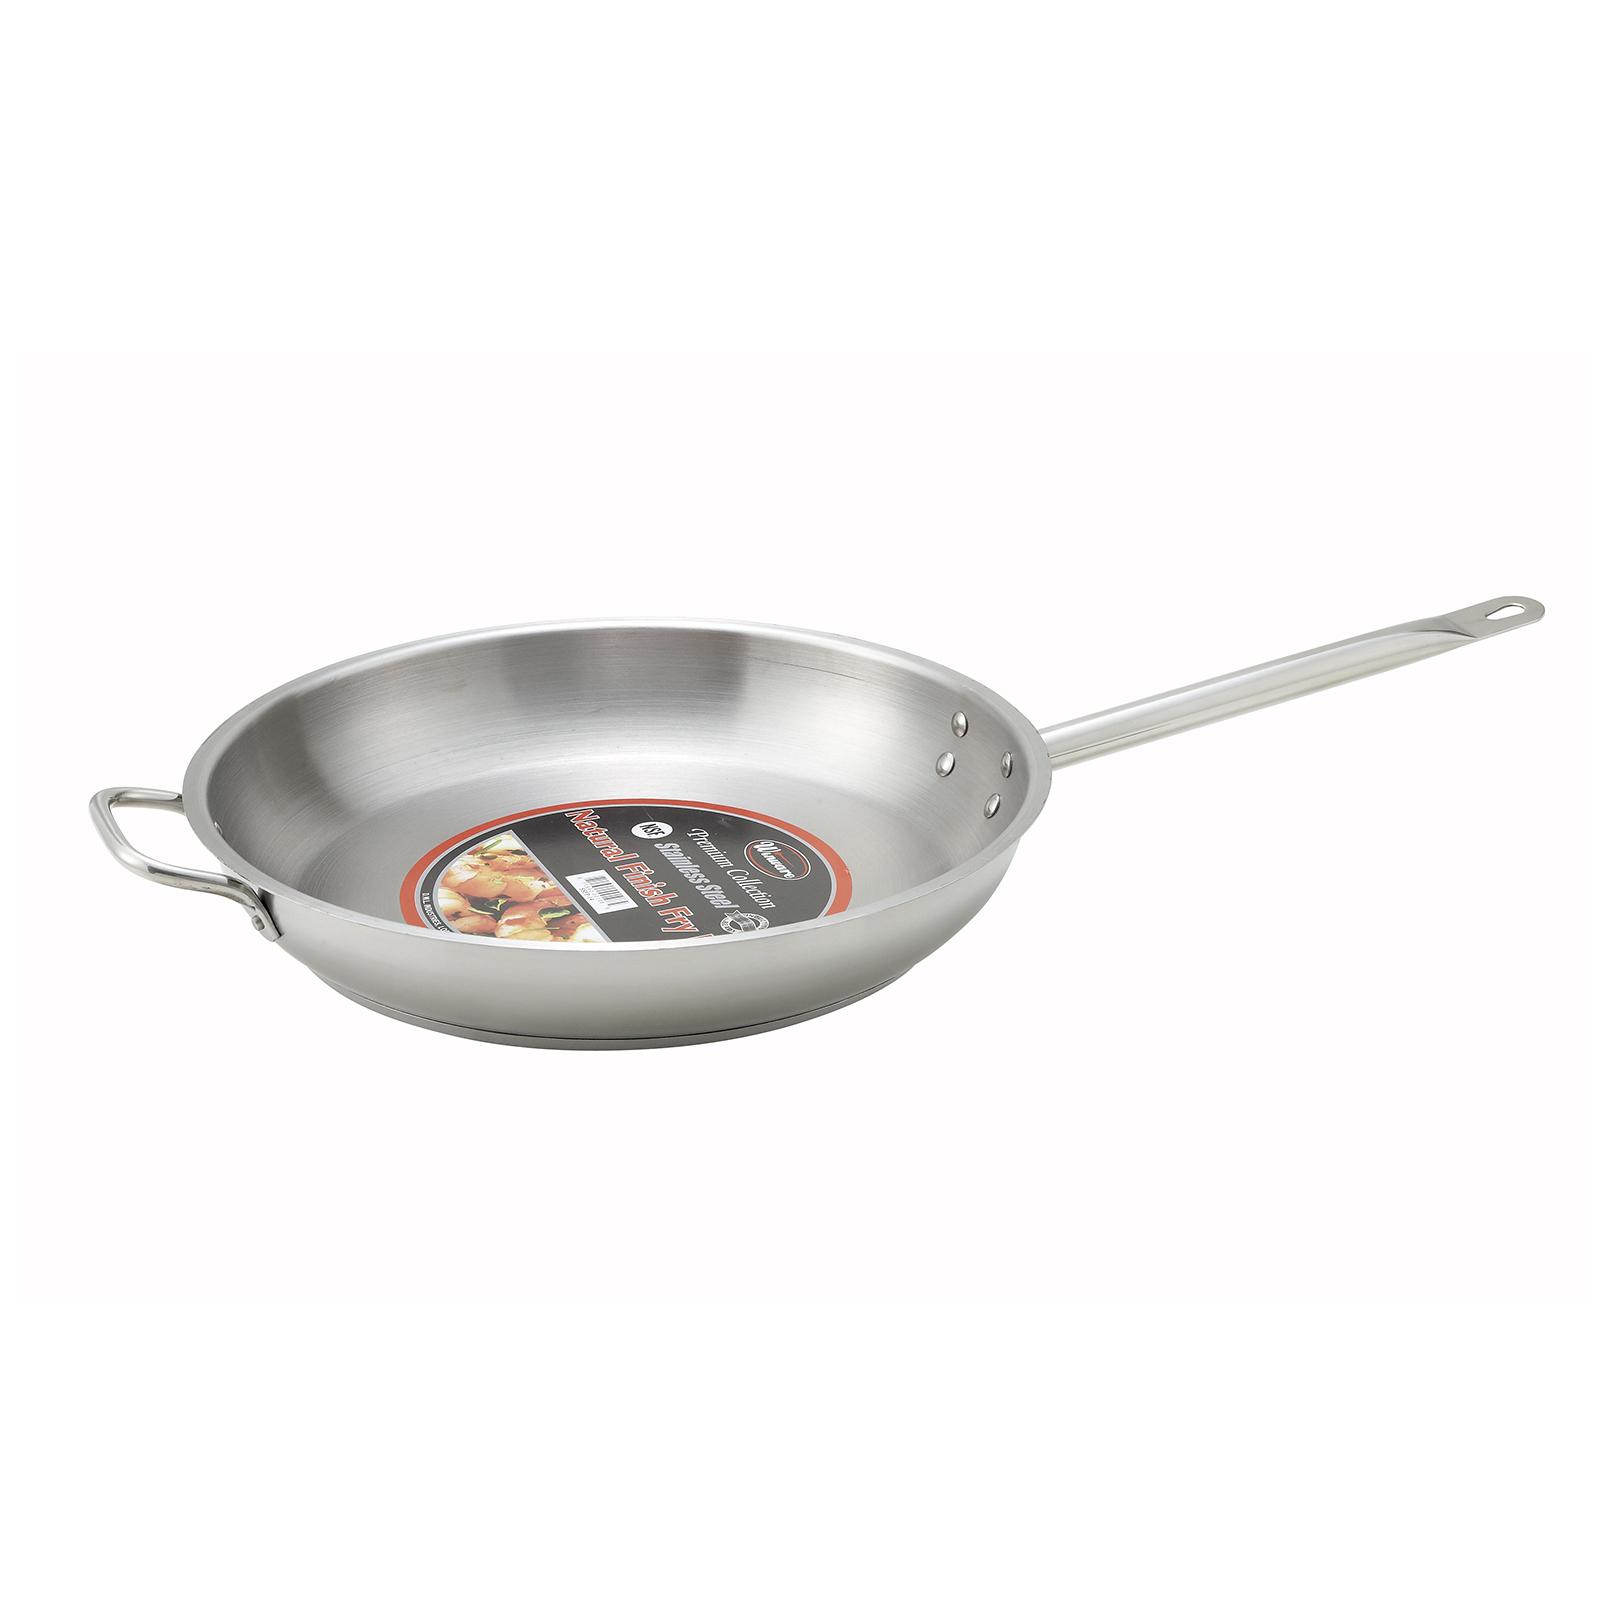 Winco SSFP-14 fry pan